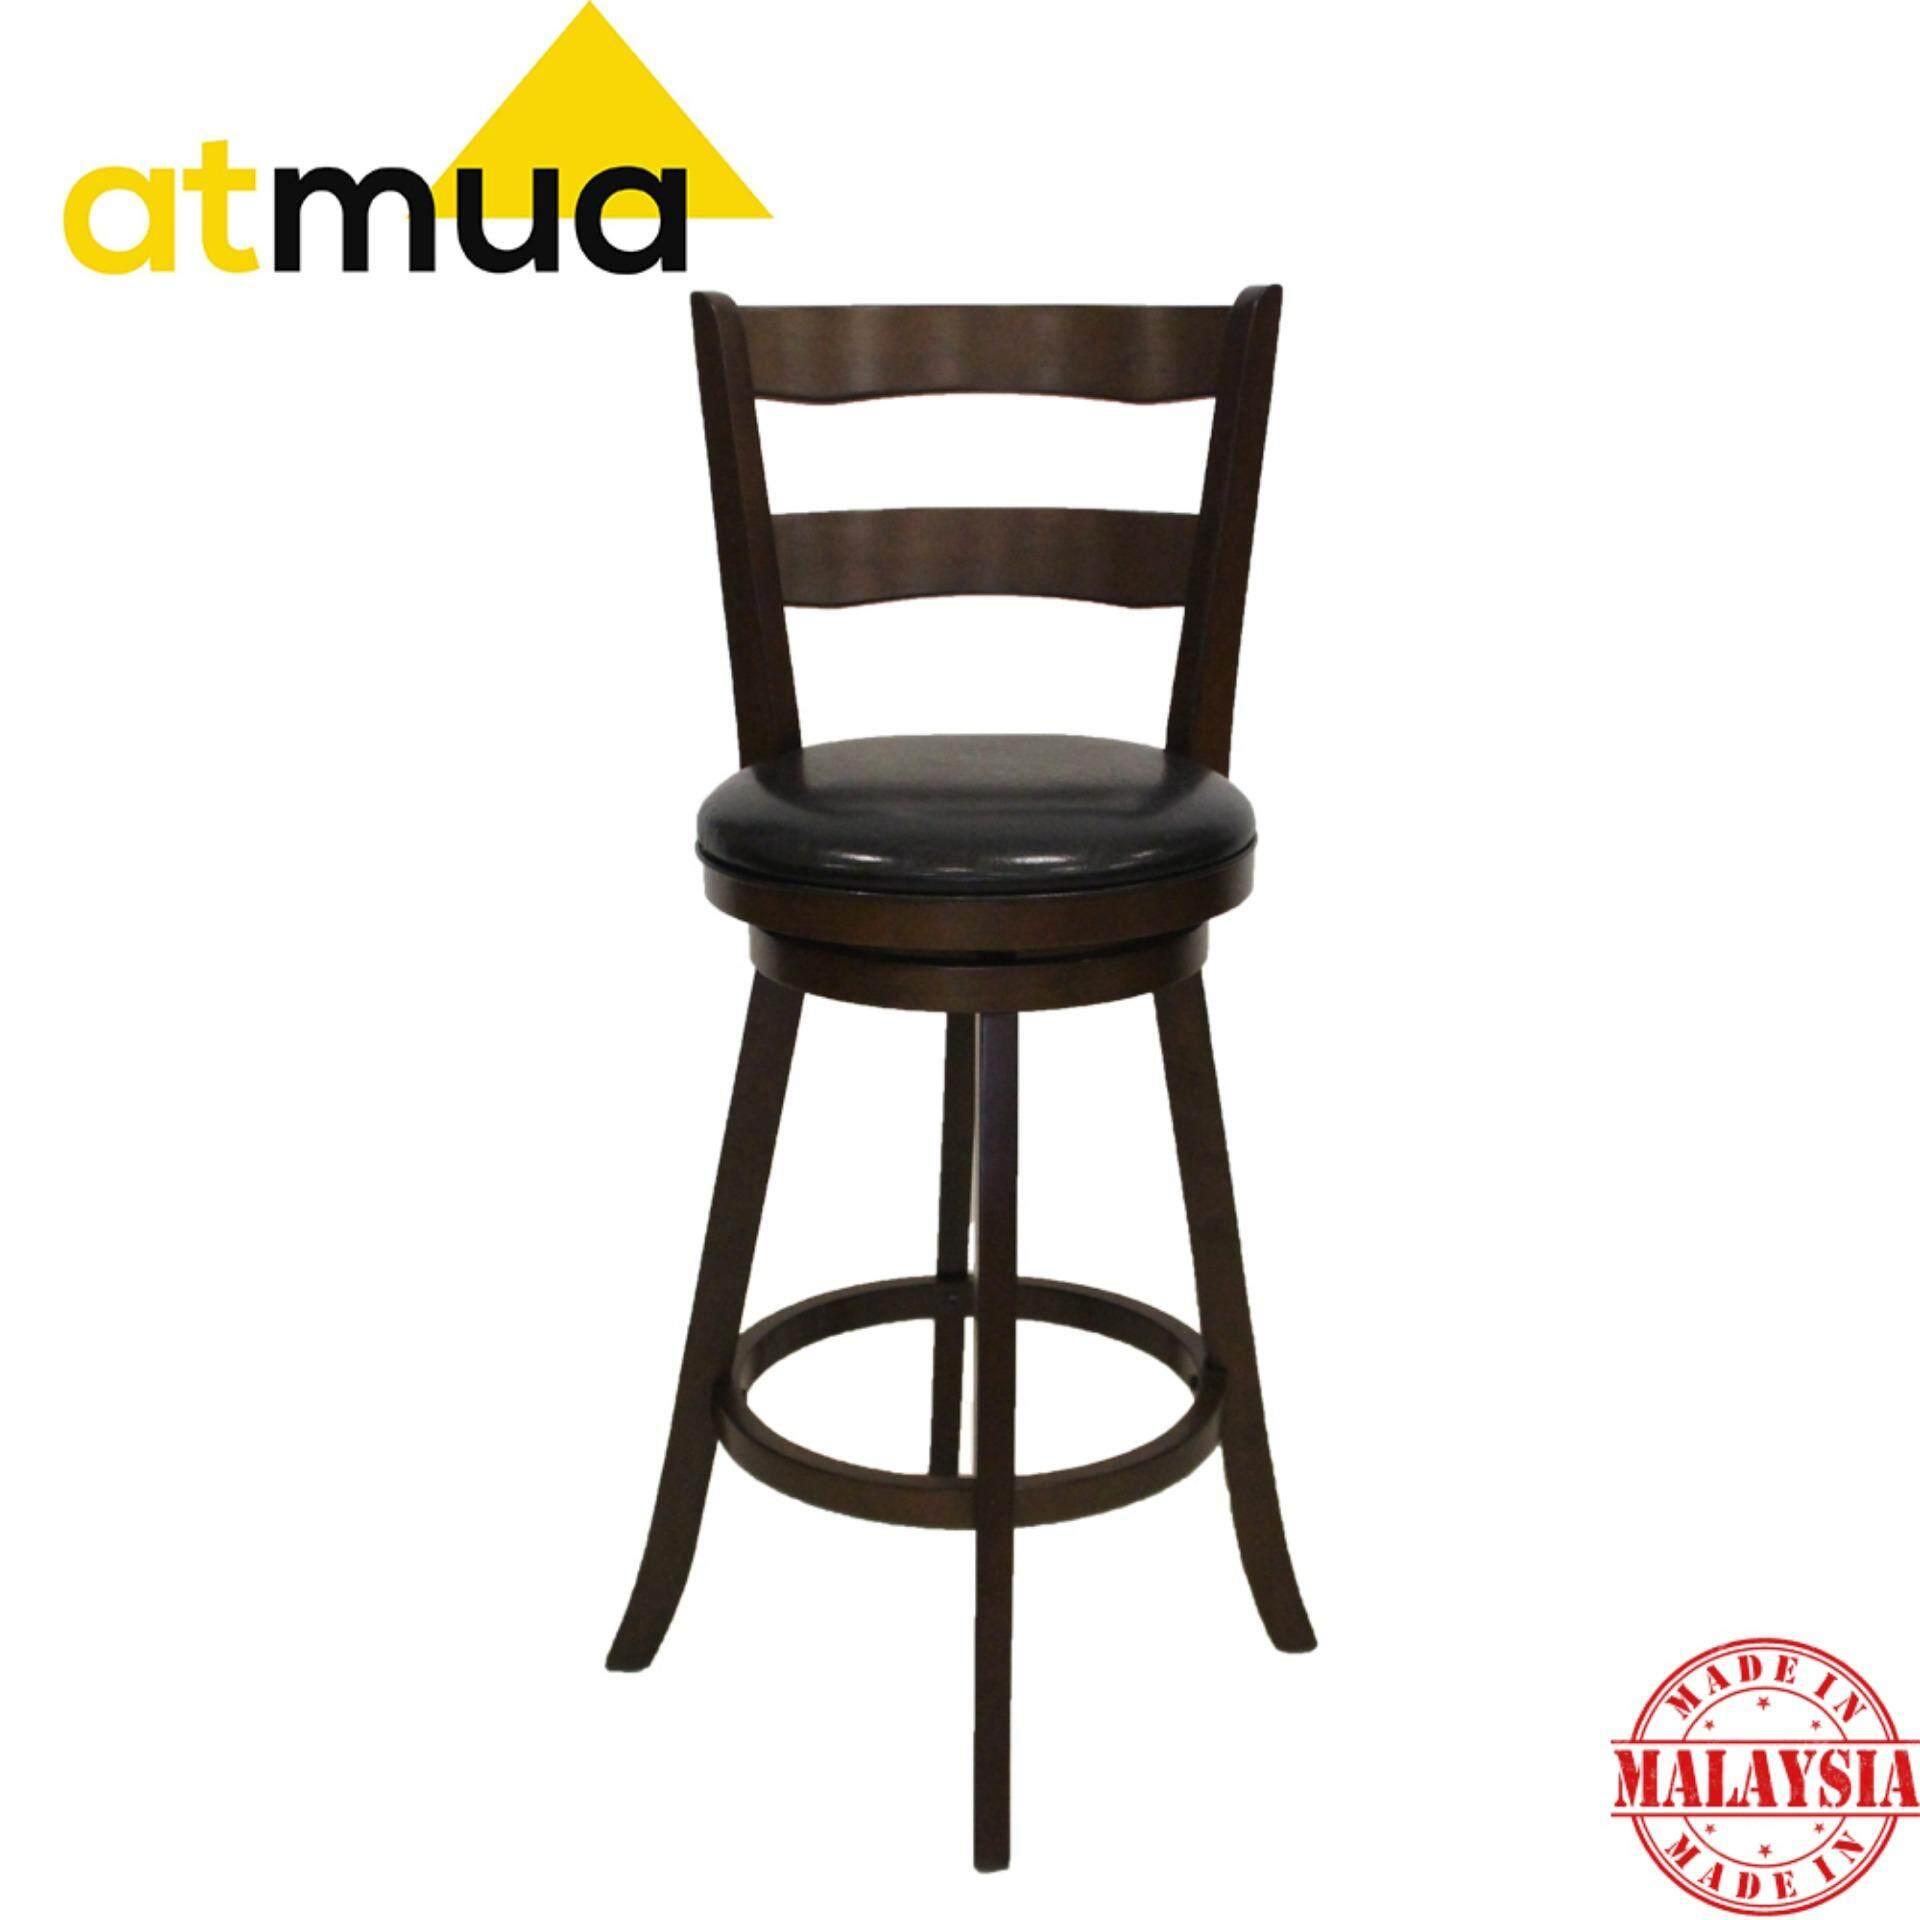 Atmua Estima Swivel Bar Chair - Height 29 inch [Full Solid Wood]